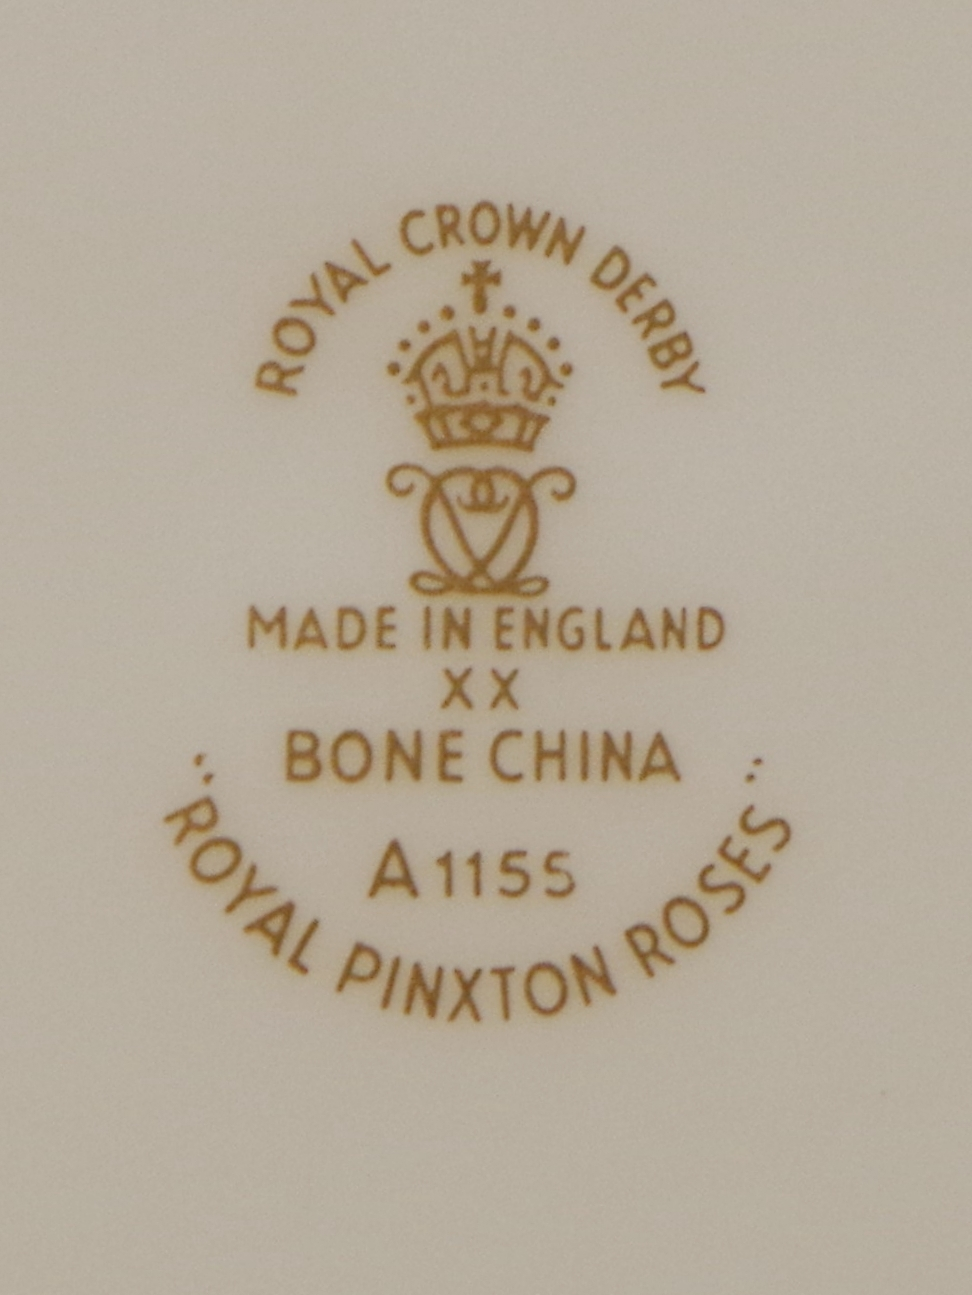 royal-crown-derby-king-faisal-II-iraq-royal-pinxton-roses-mark